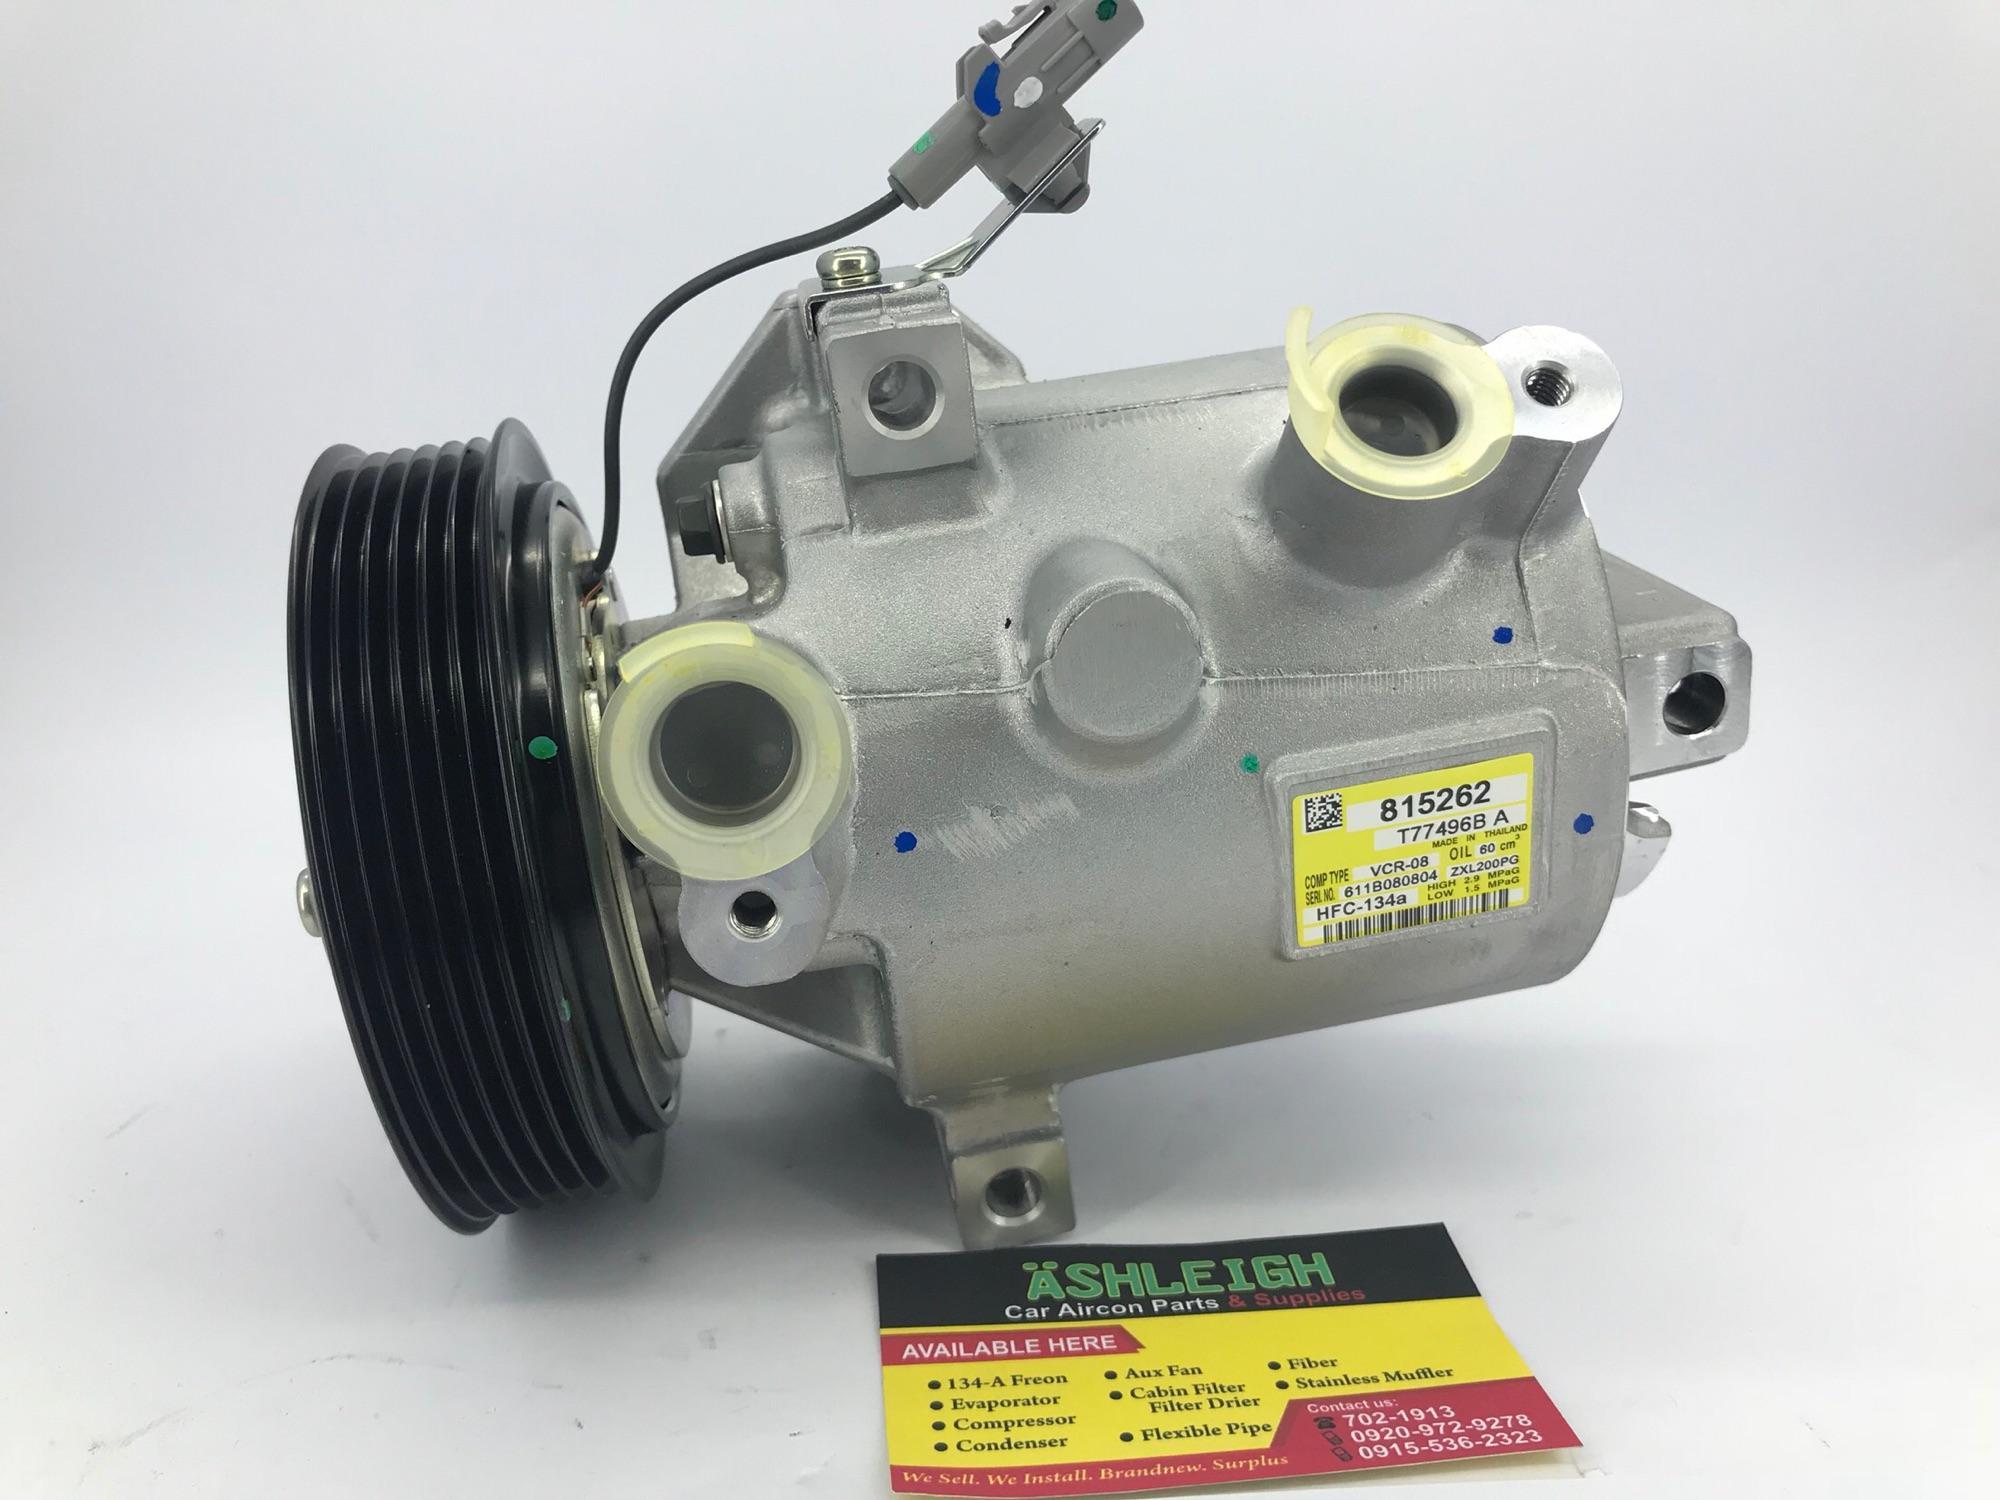 Buy Sell Cheapest Mitsubishi Montero Compressor Best Quality Evaporator Migare Mirage Car Aircon Sedan Hatchback